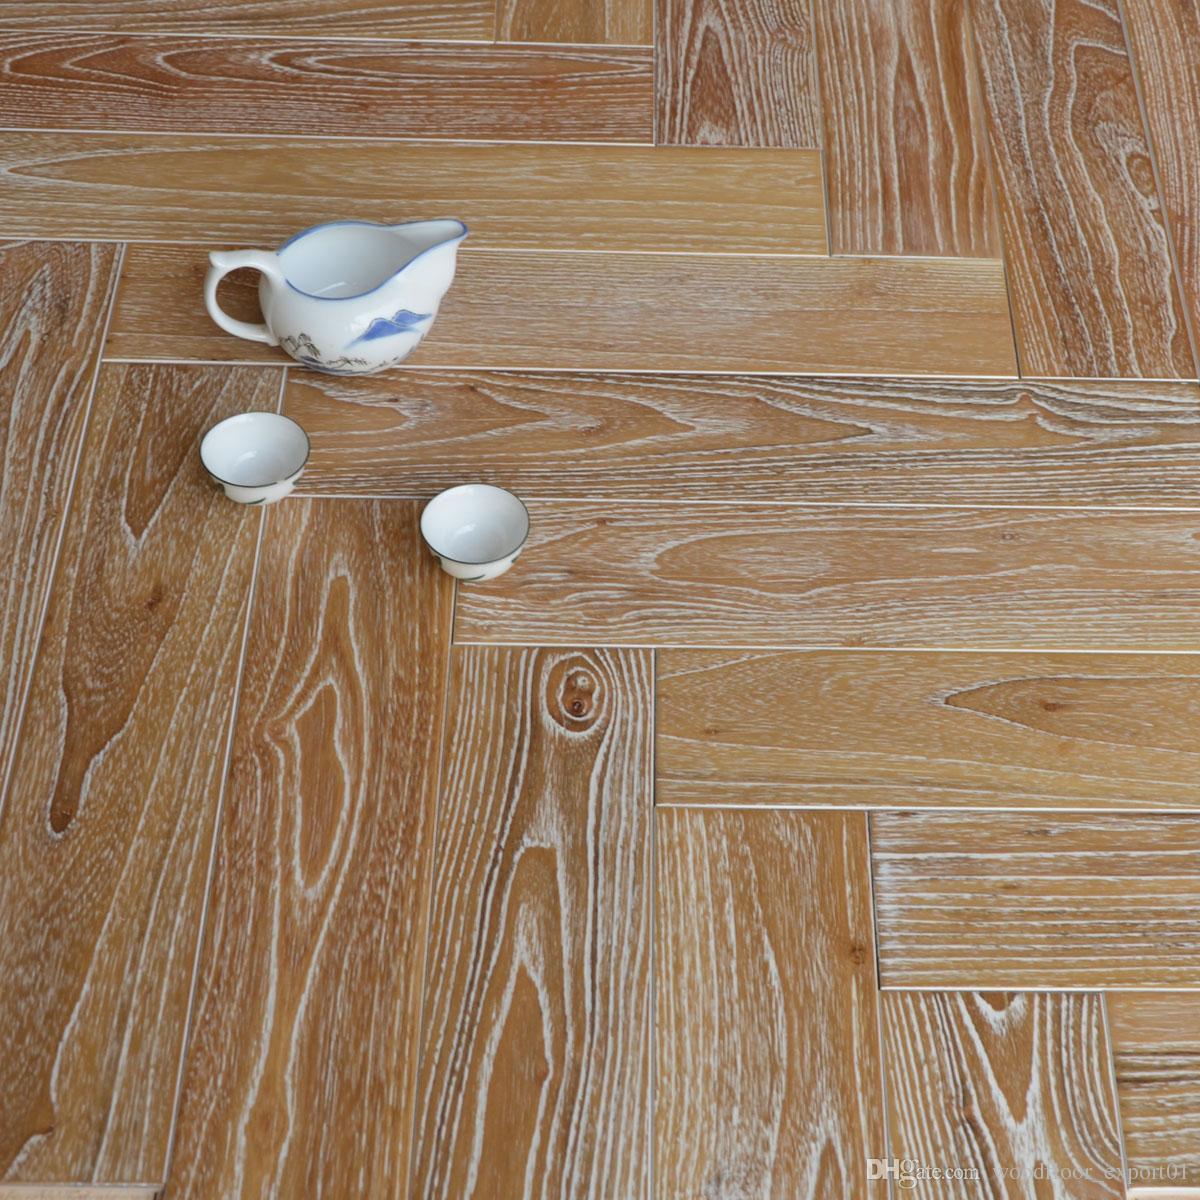 Oak Bedroom Decor Decoration Decorative Deck Laminate Flooring Lam Solid Wood Tiles Timber Floorin Home Livingmall Set Carpet